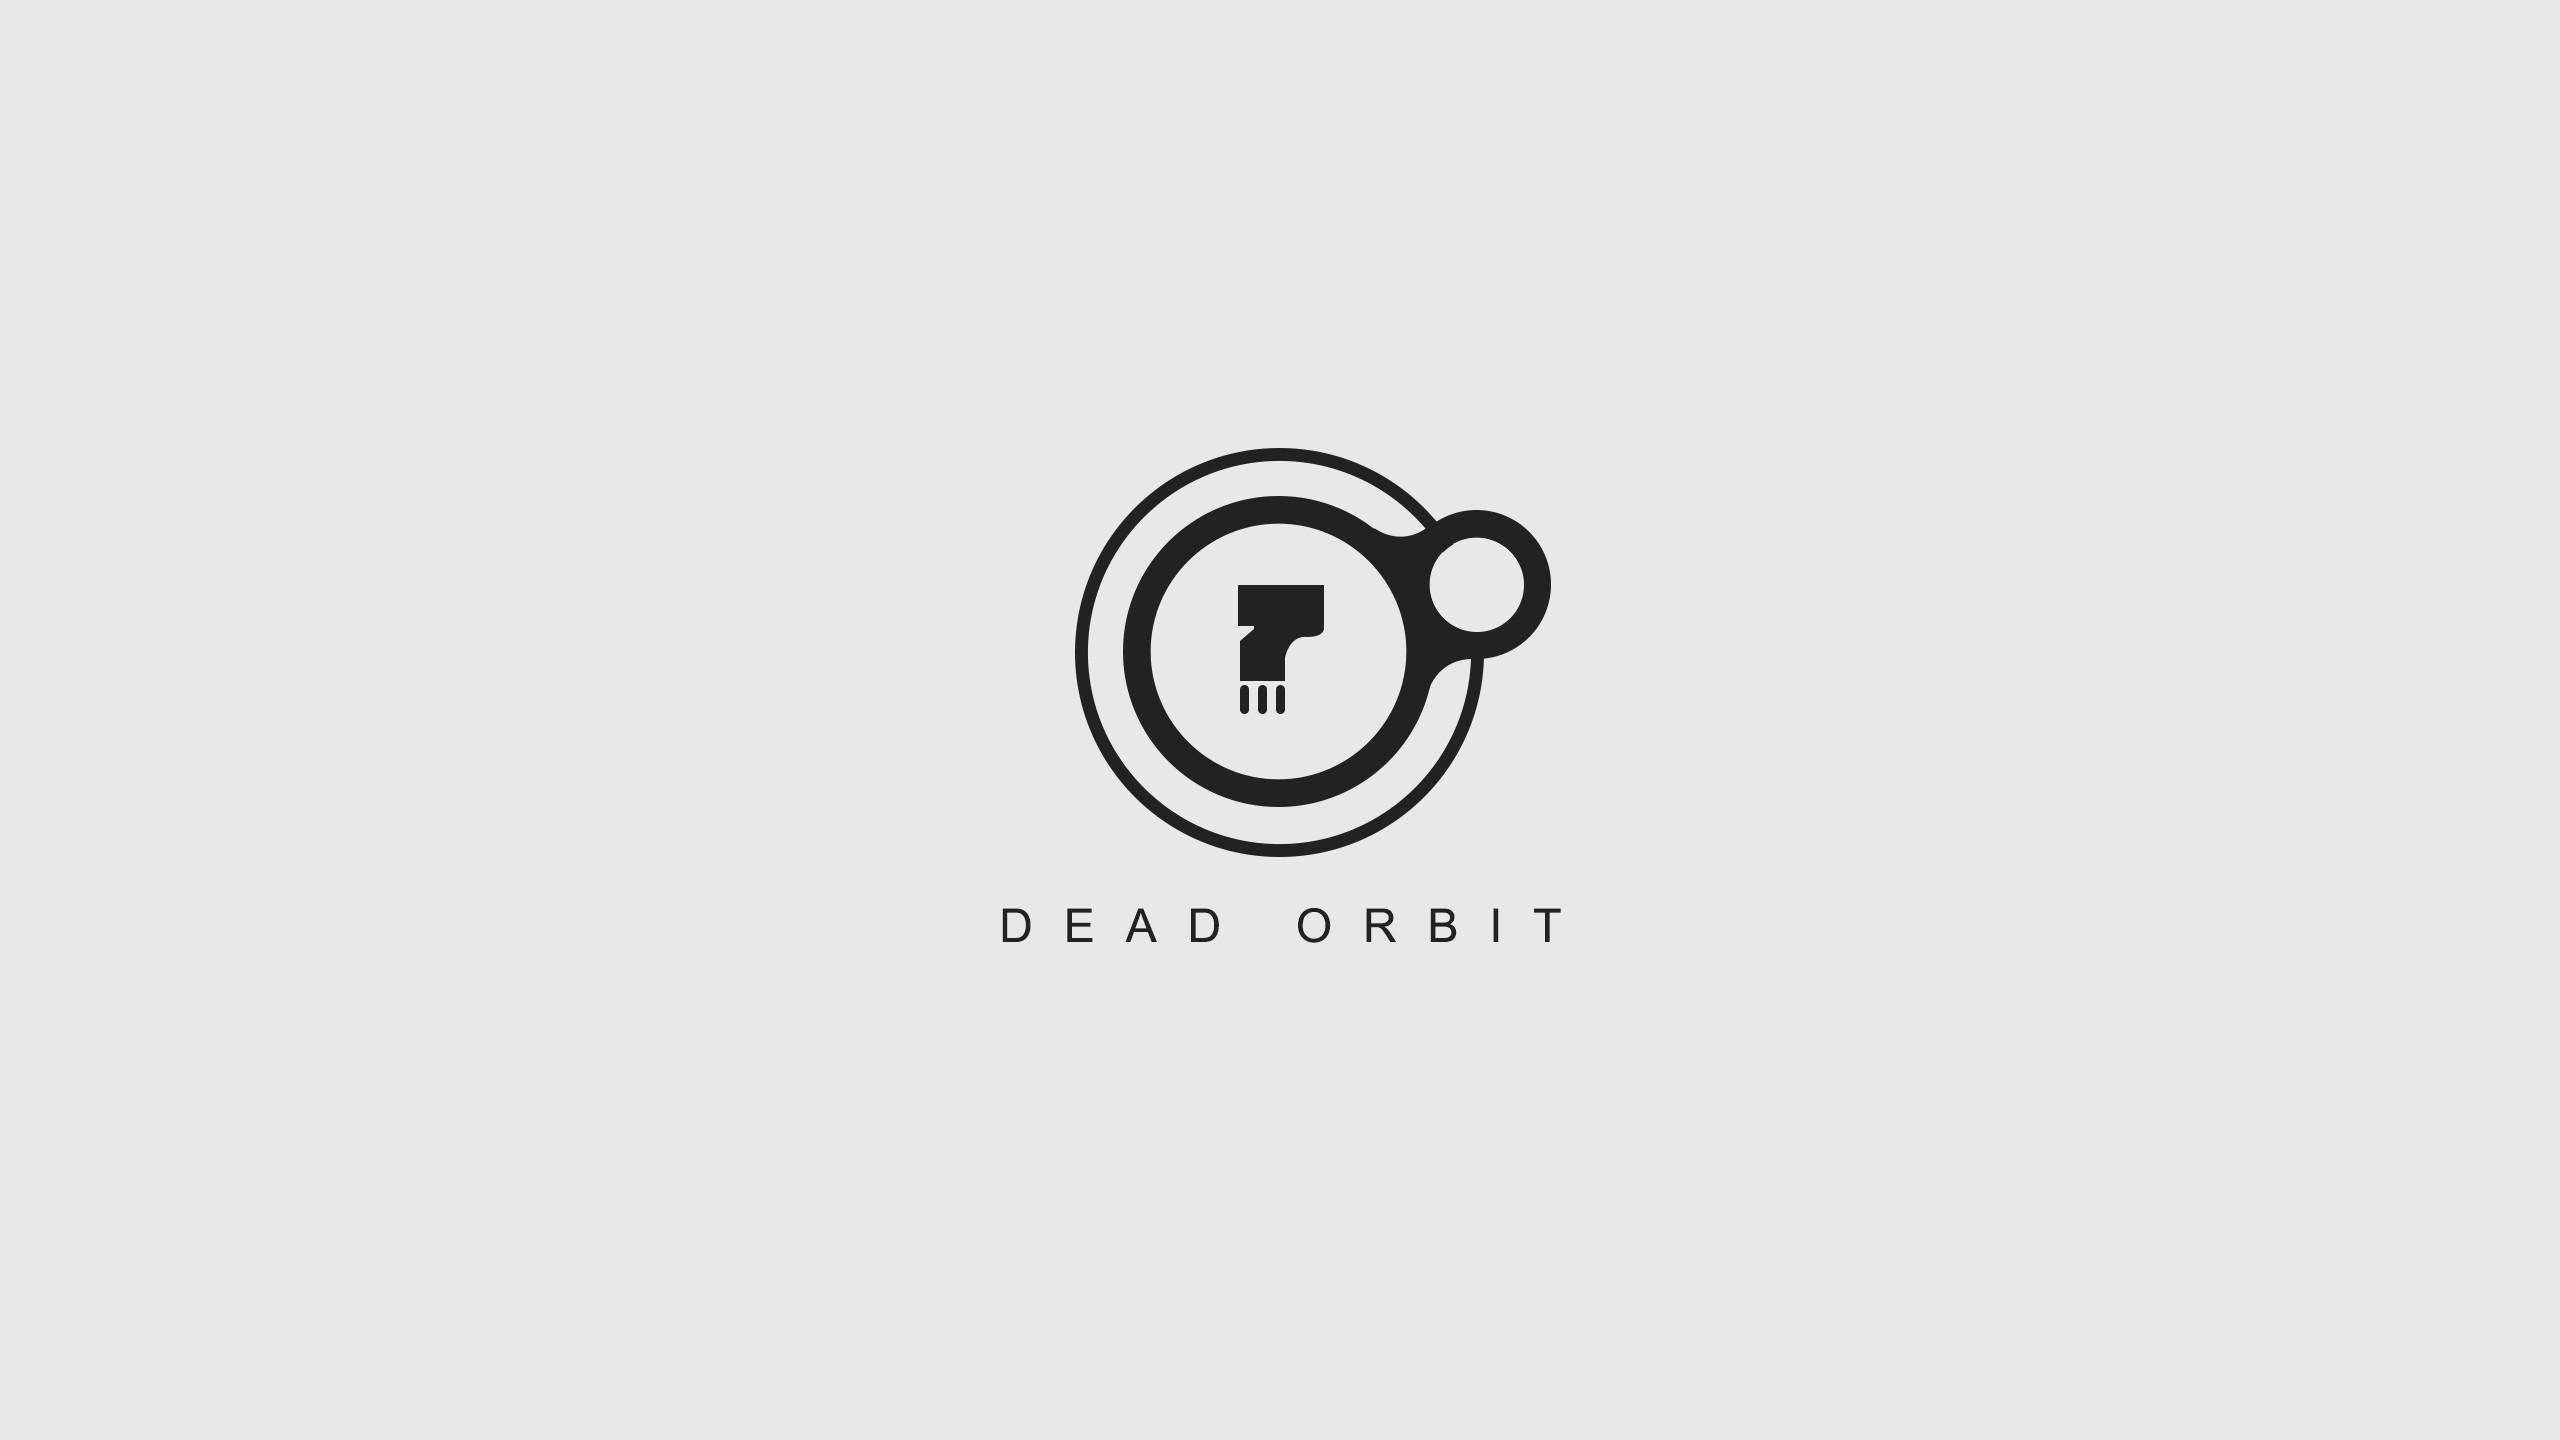 General Destiny (video game) Dead Orbit